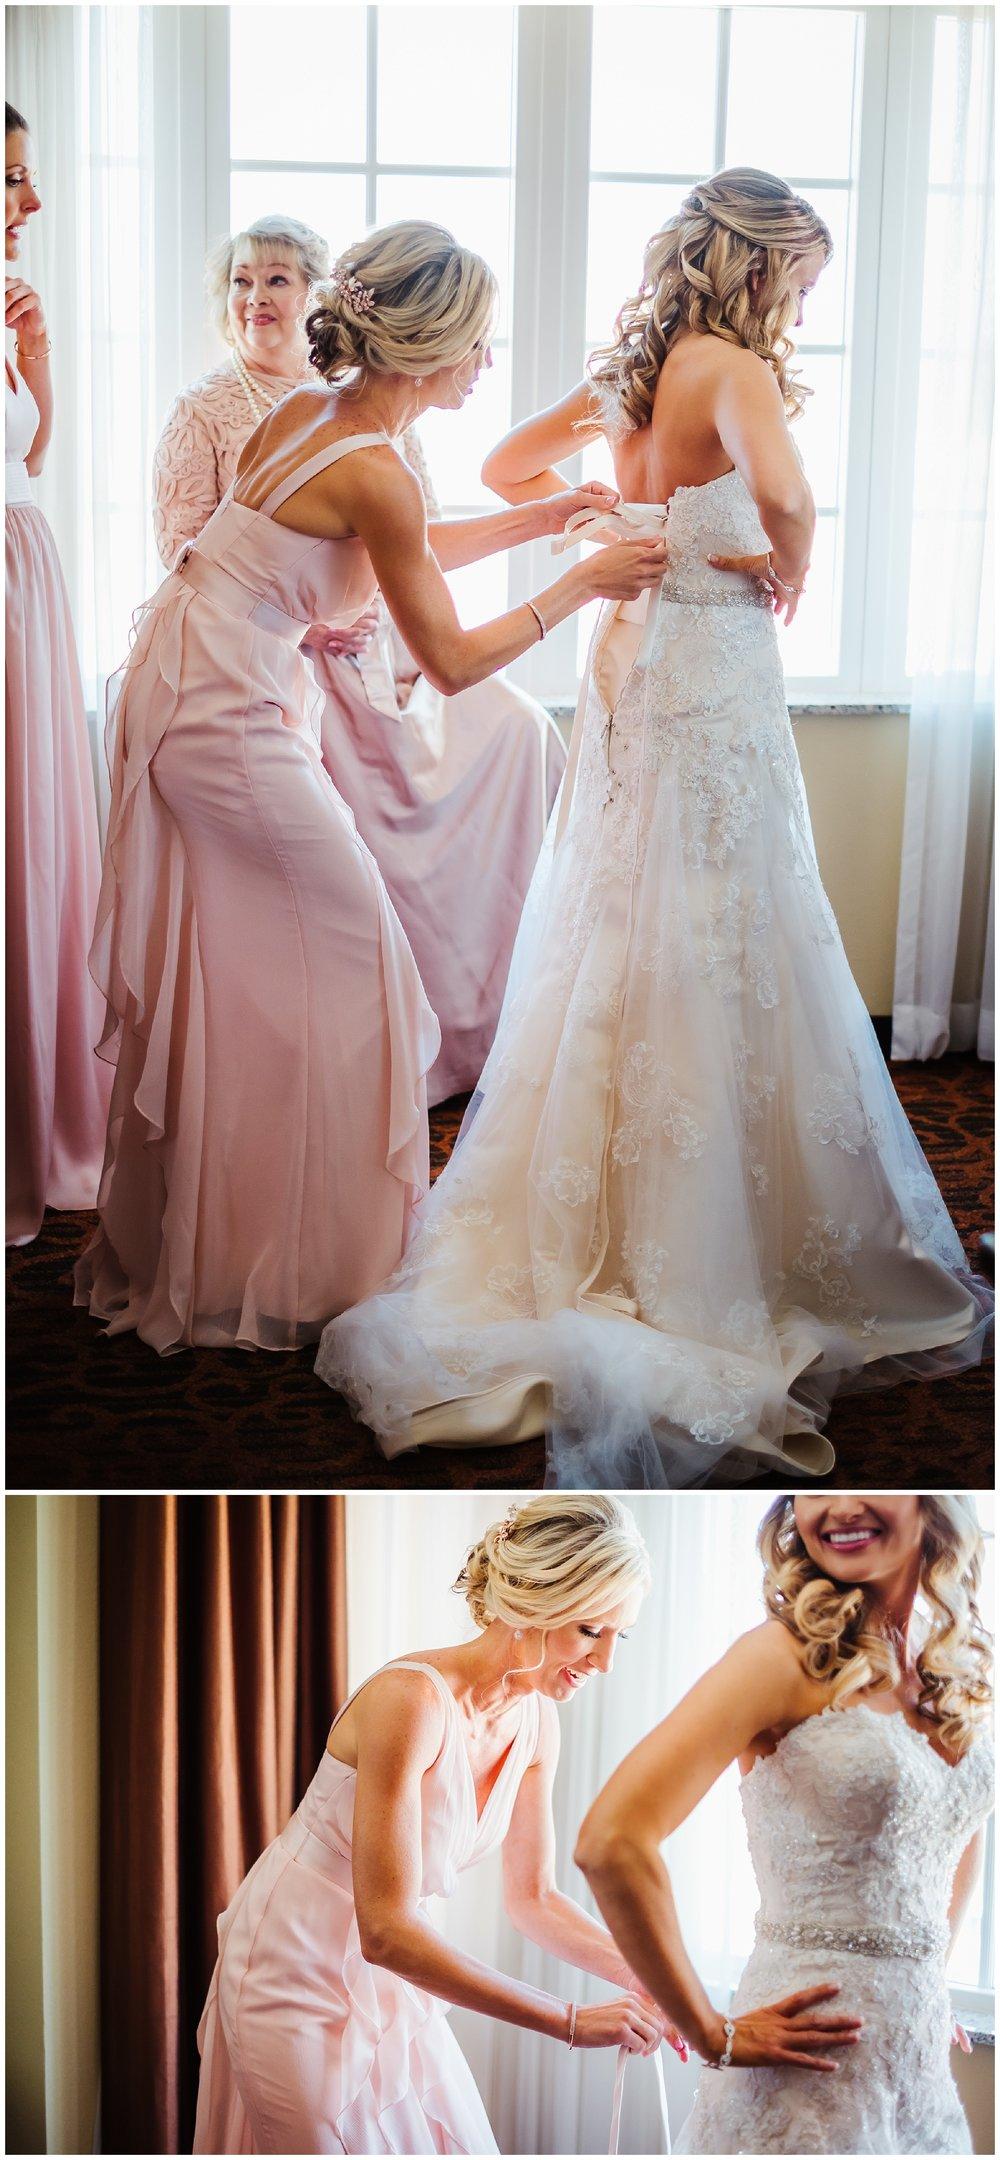 tampa-bradenton-wedding-photographer-south-florida-museum-classic-blush-gold-alpacas-sparklers_0010.jpg